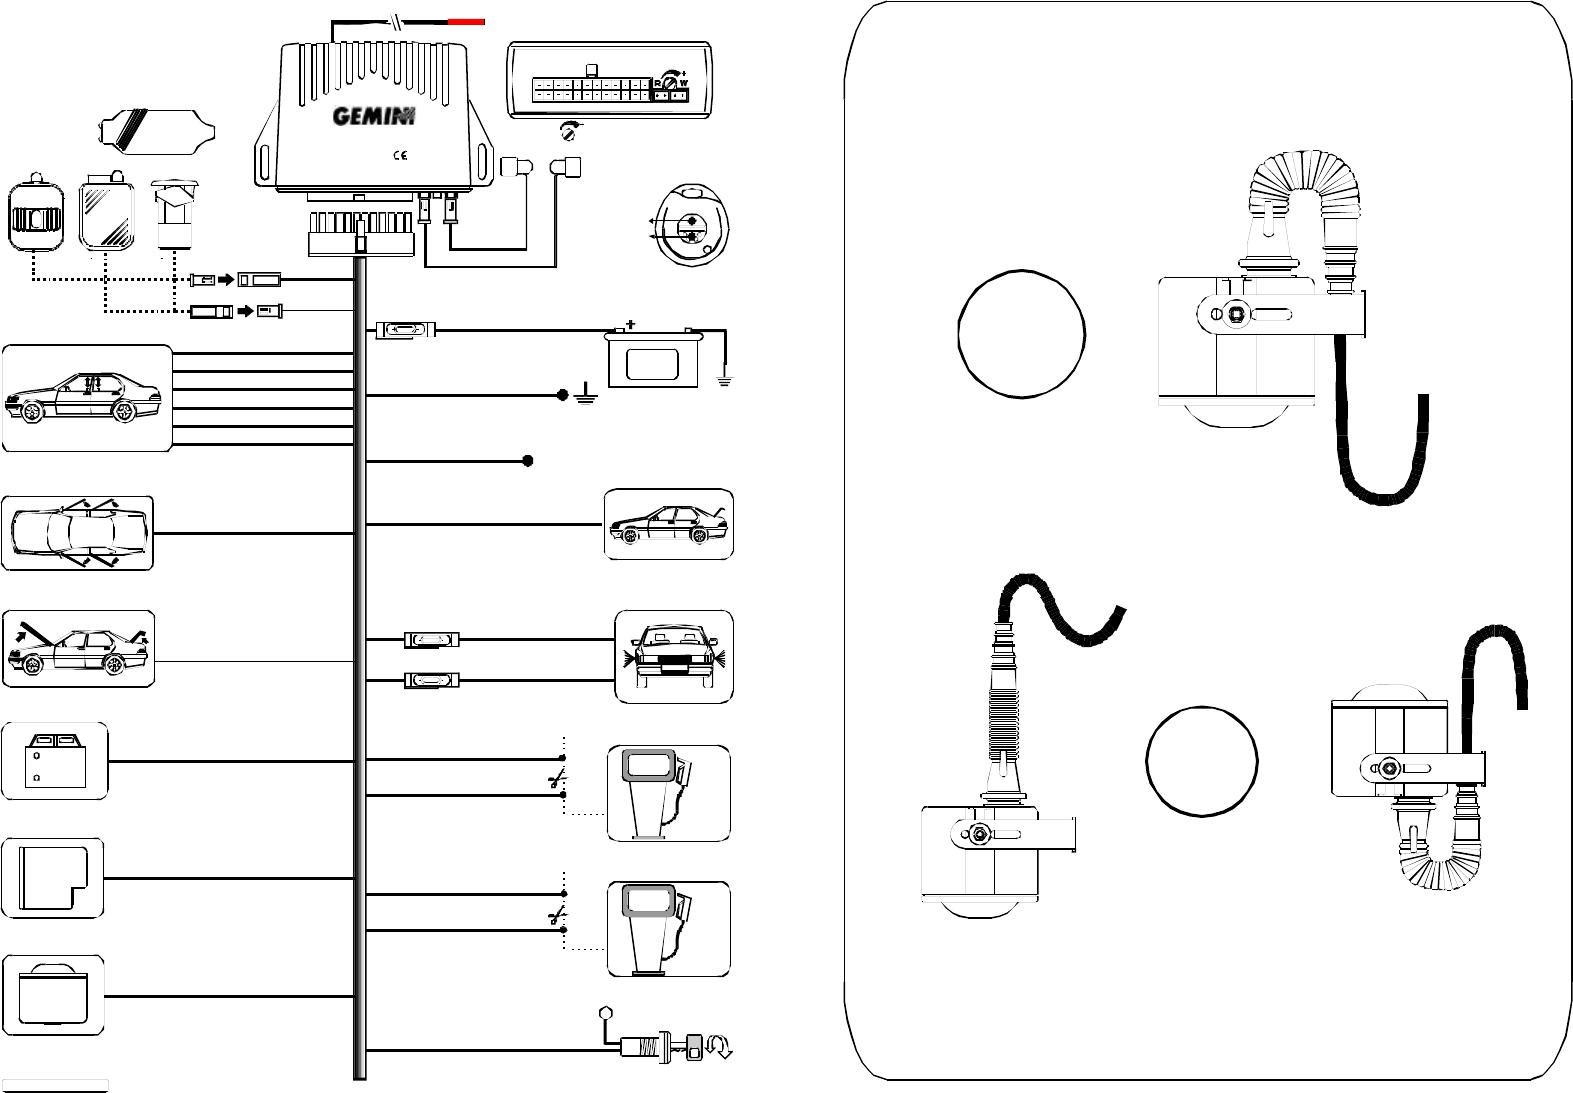 Manual Gemini 7590 (page 1 of 12) (English)   Gemini Car Alarm Wiring Diagram      Libble.eu